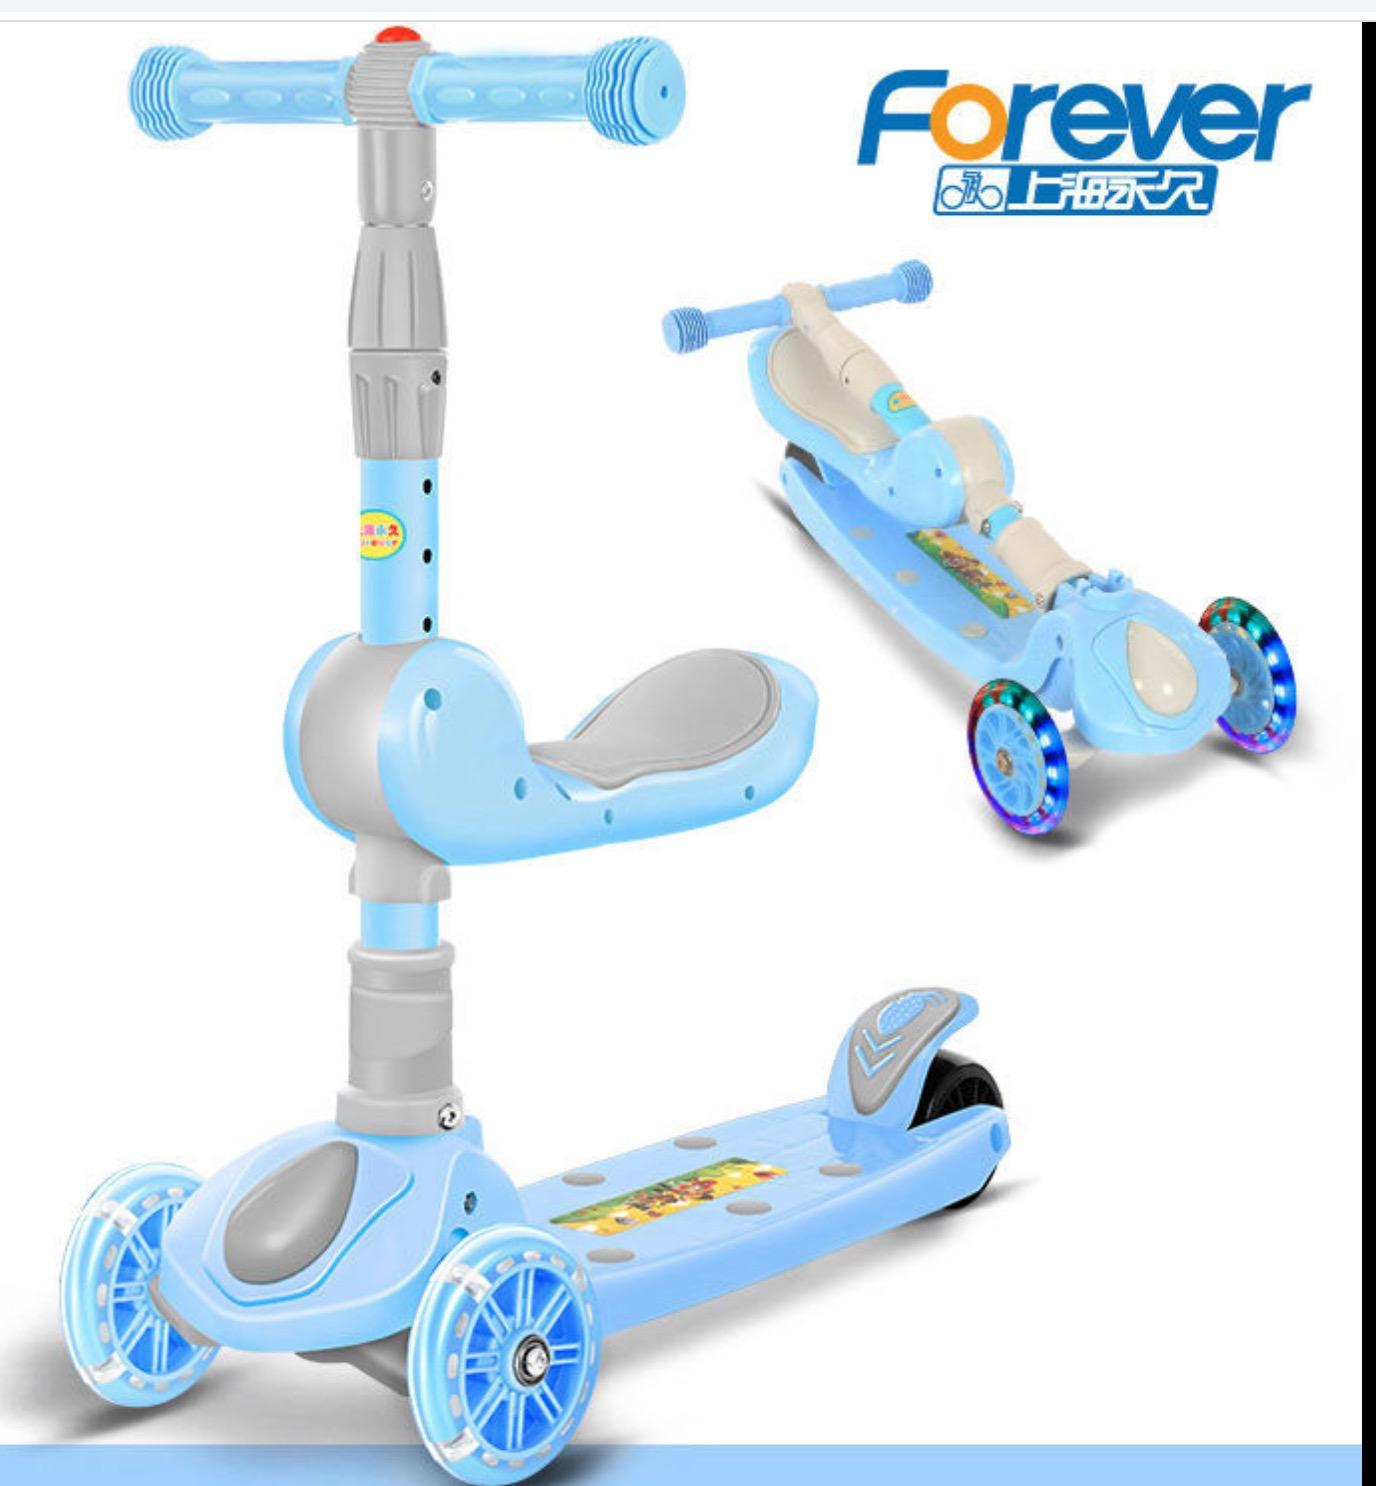 FOREVER 永久 儿童滑板车